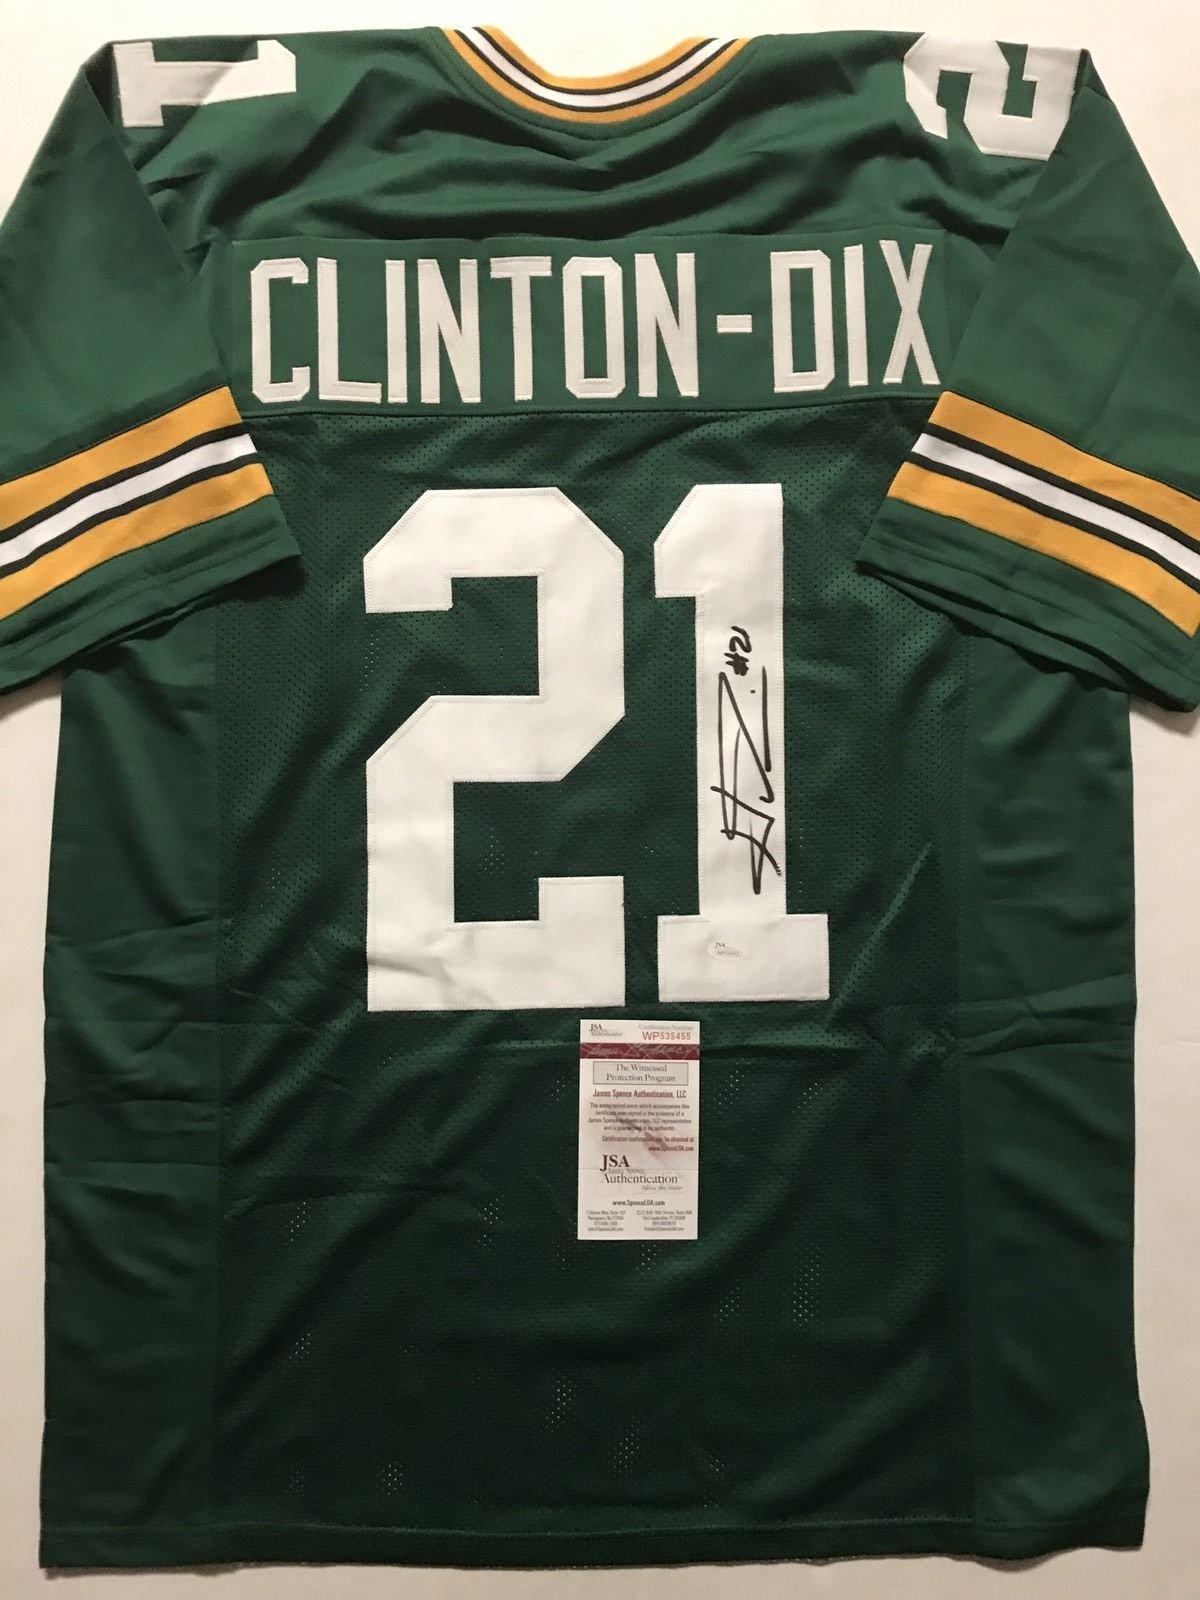 Autographed/Signed Ha Ha HaHa Clinton Dix Green Bay Green Football Jersey JSA COA